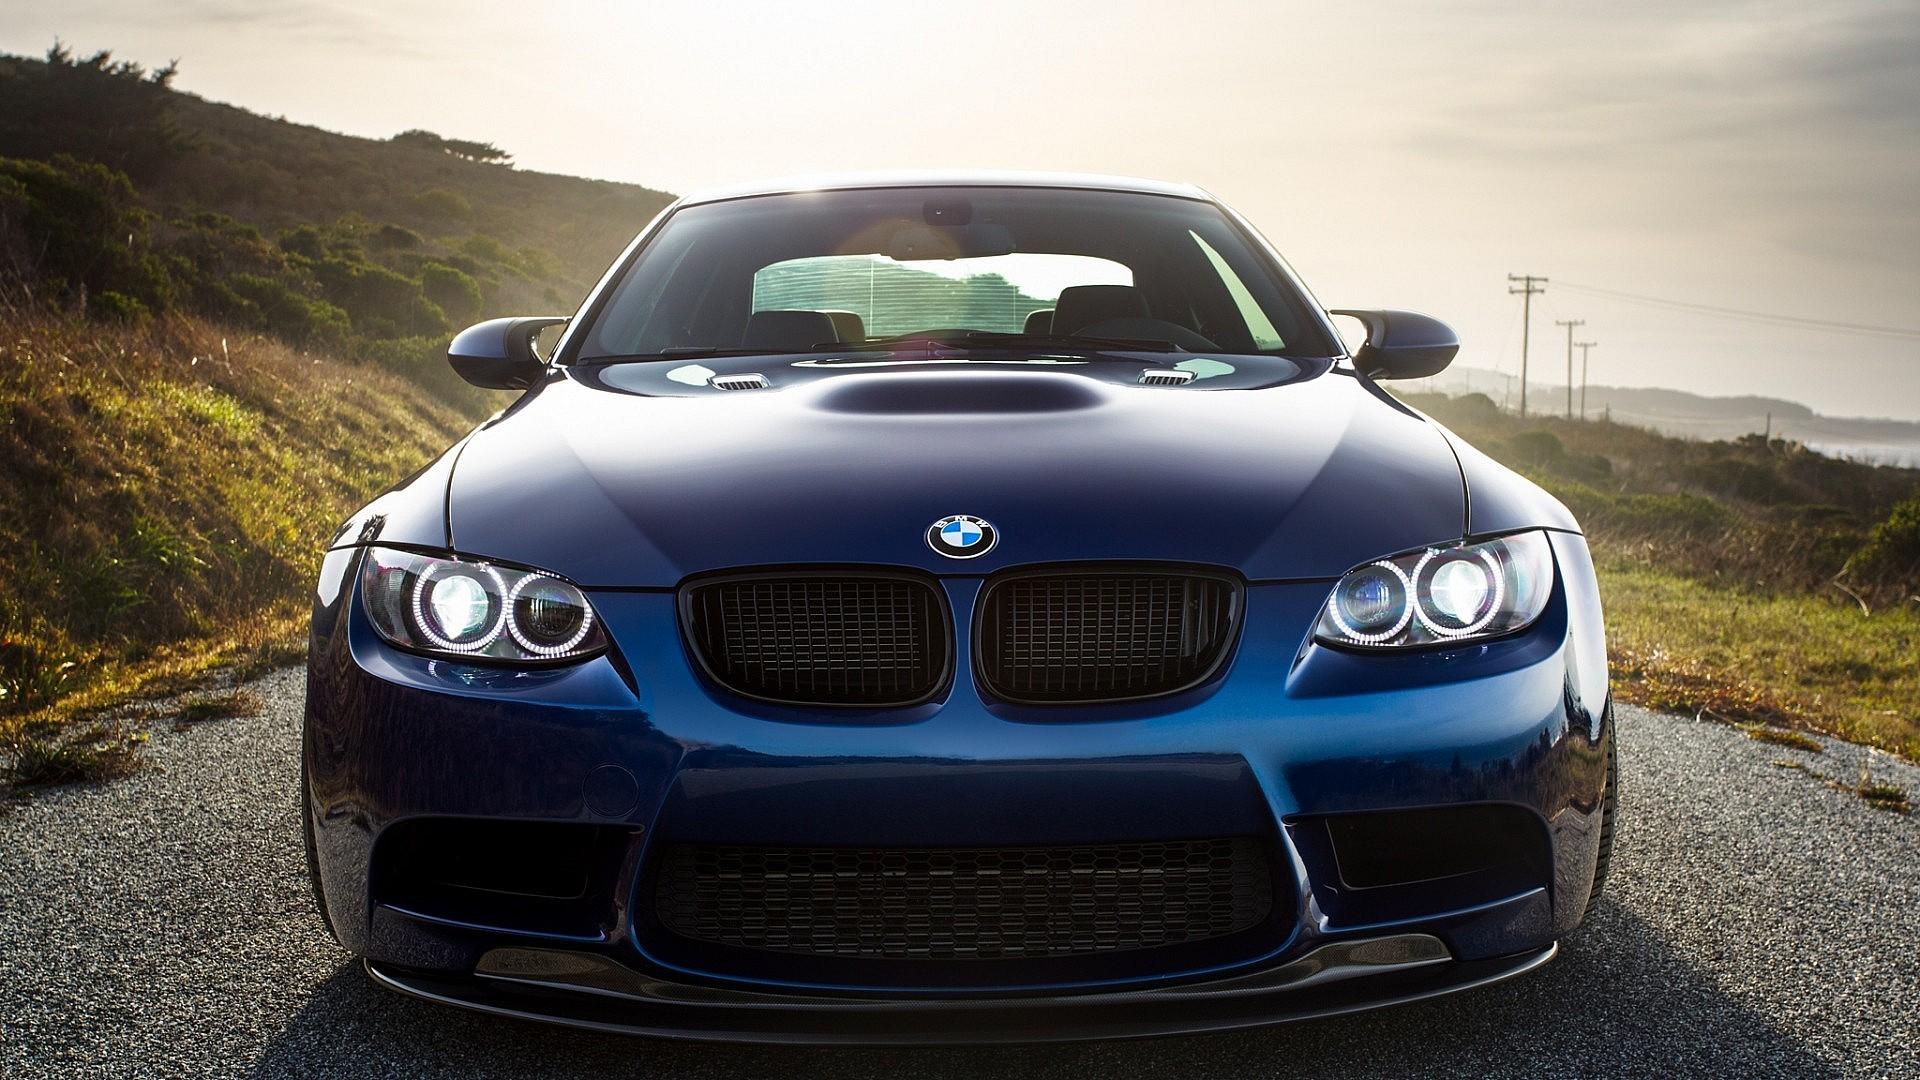 2048x1363 Wallpapers Bmw M3 E46 Black Wheels Coupe